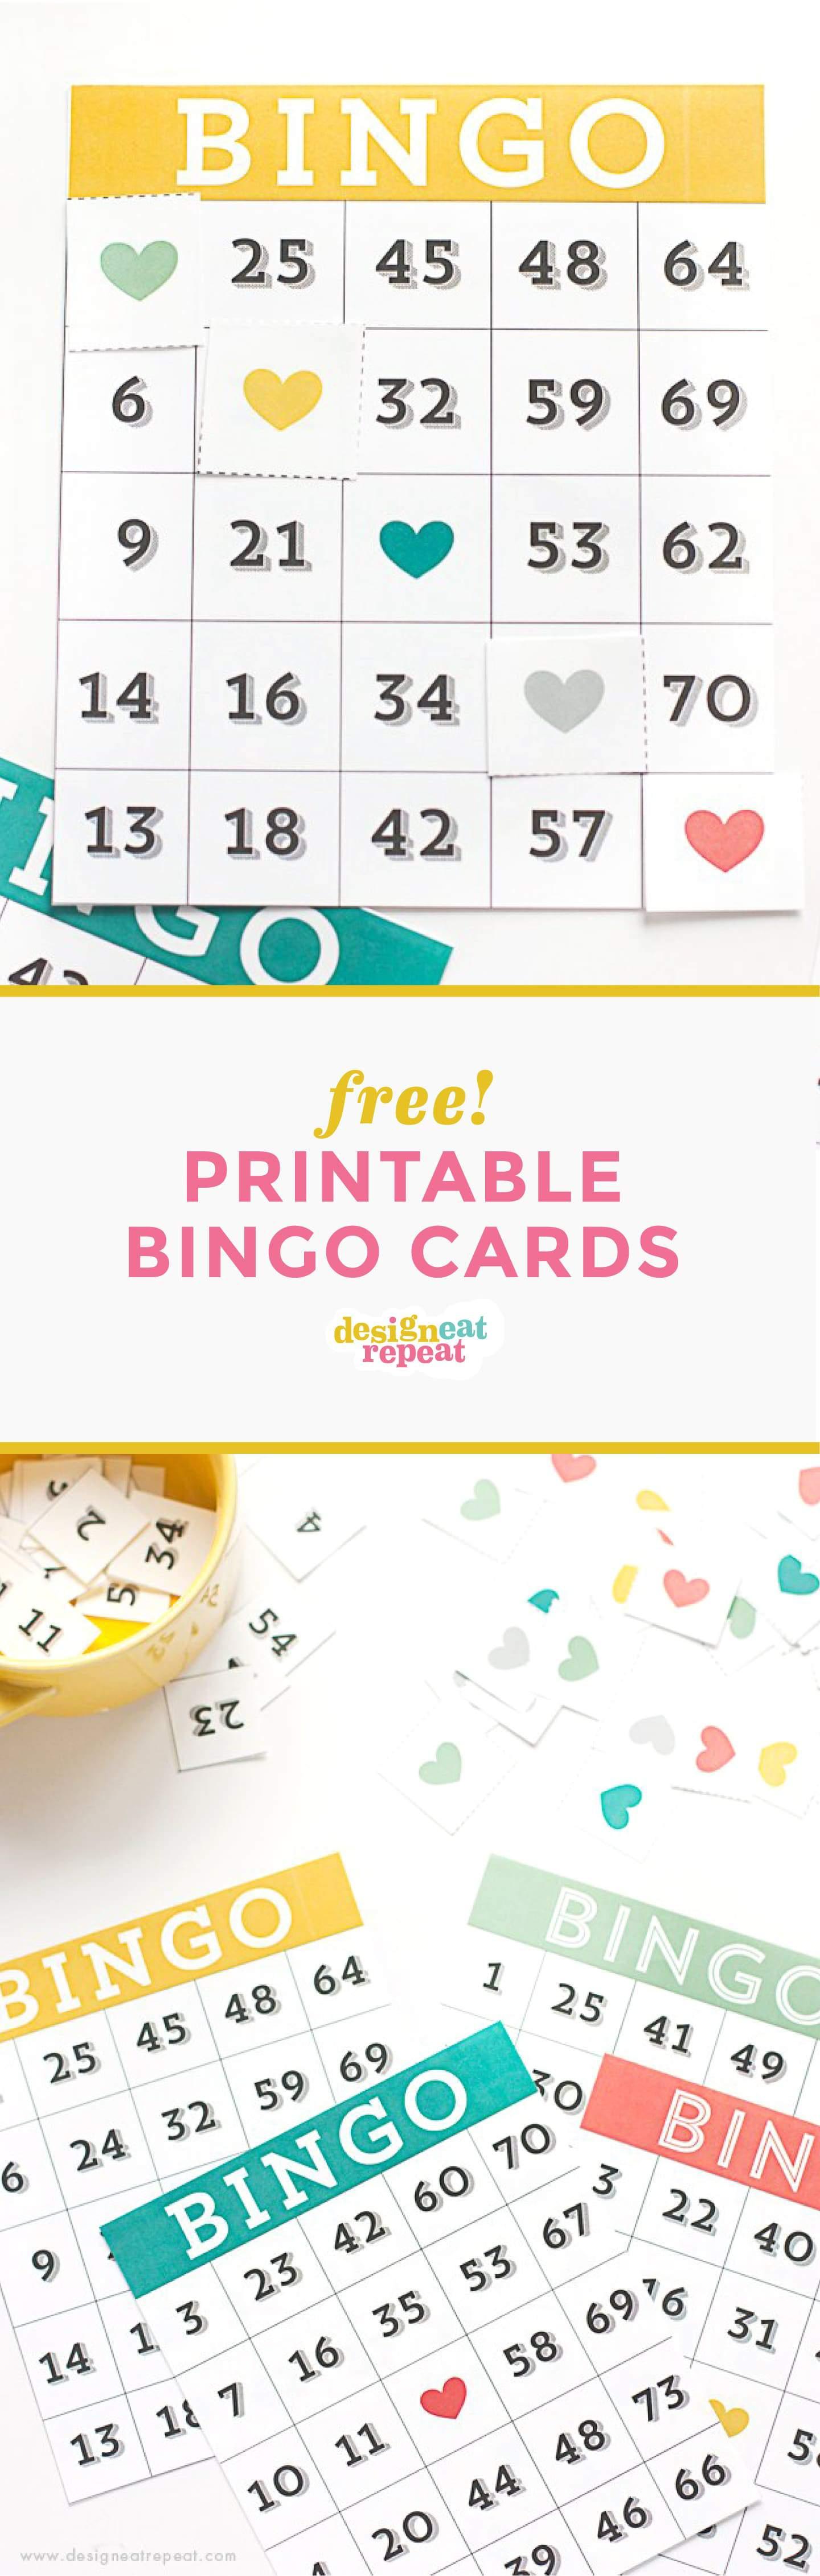 Printable Bingo Cards - Game Night Idea! - Design Eat Repeat - Free Printable Bingo Cards Random Numbers